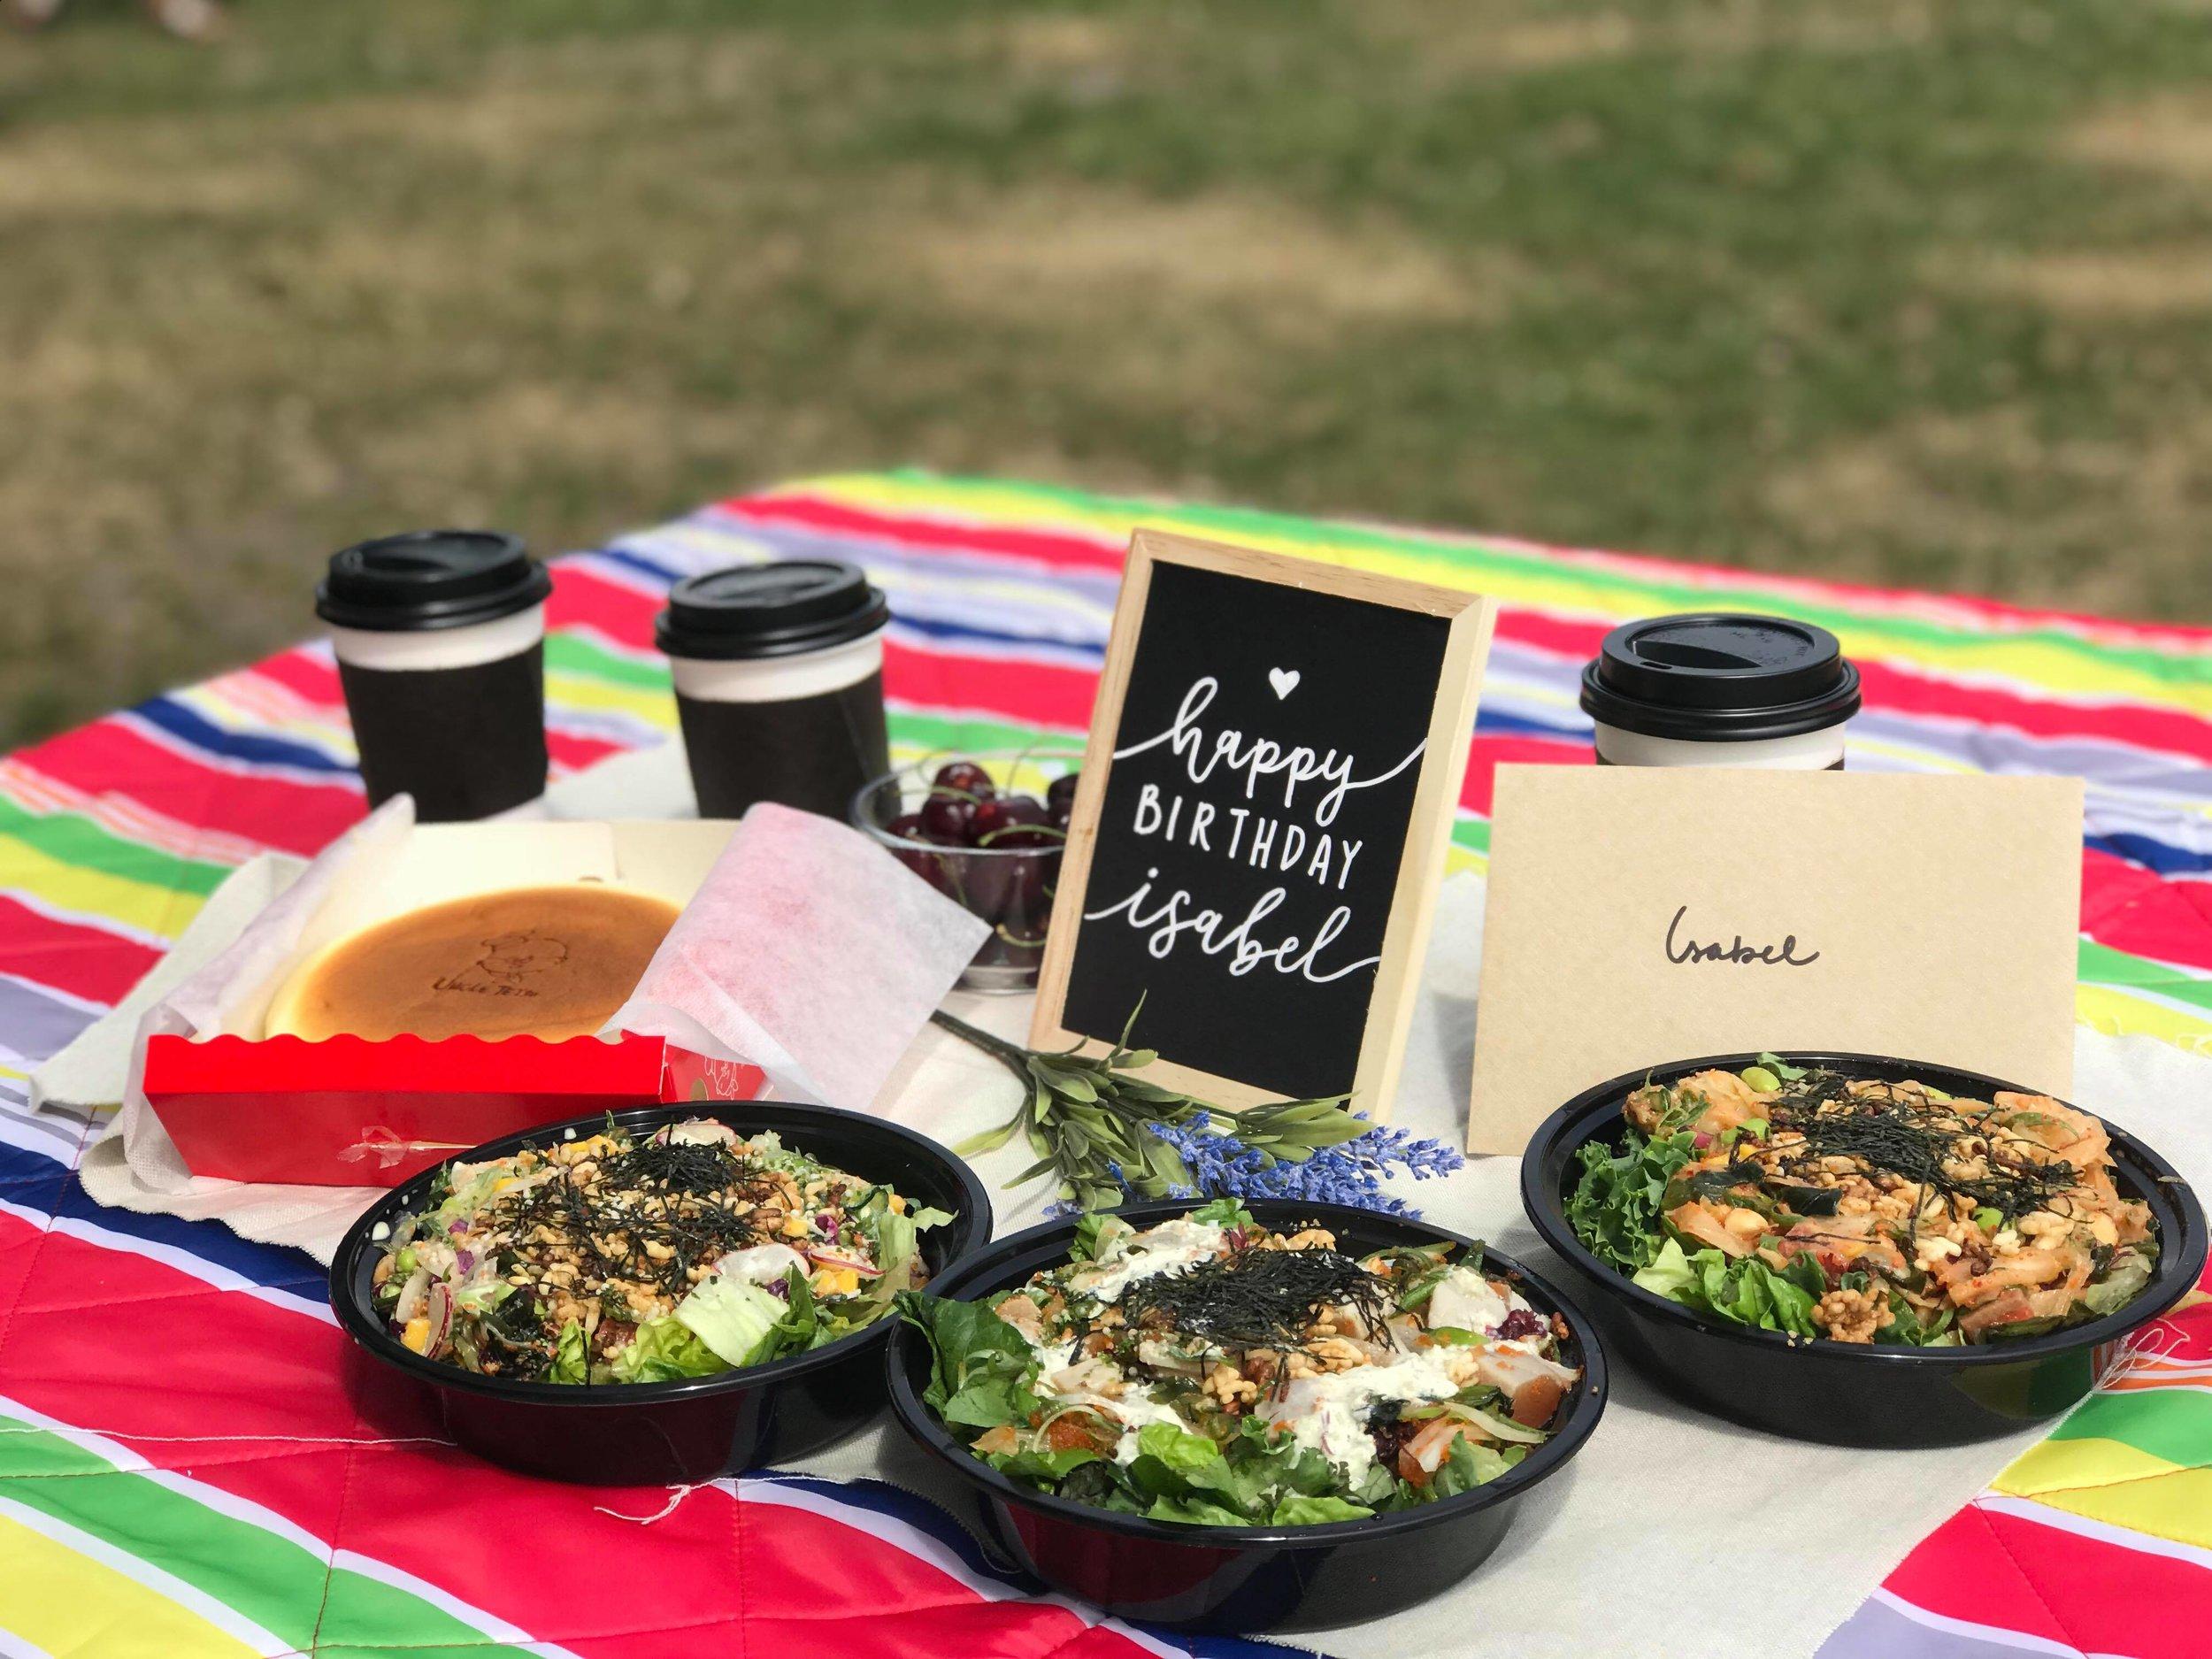 birthday picnic